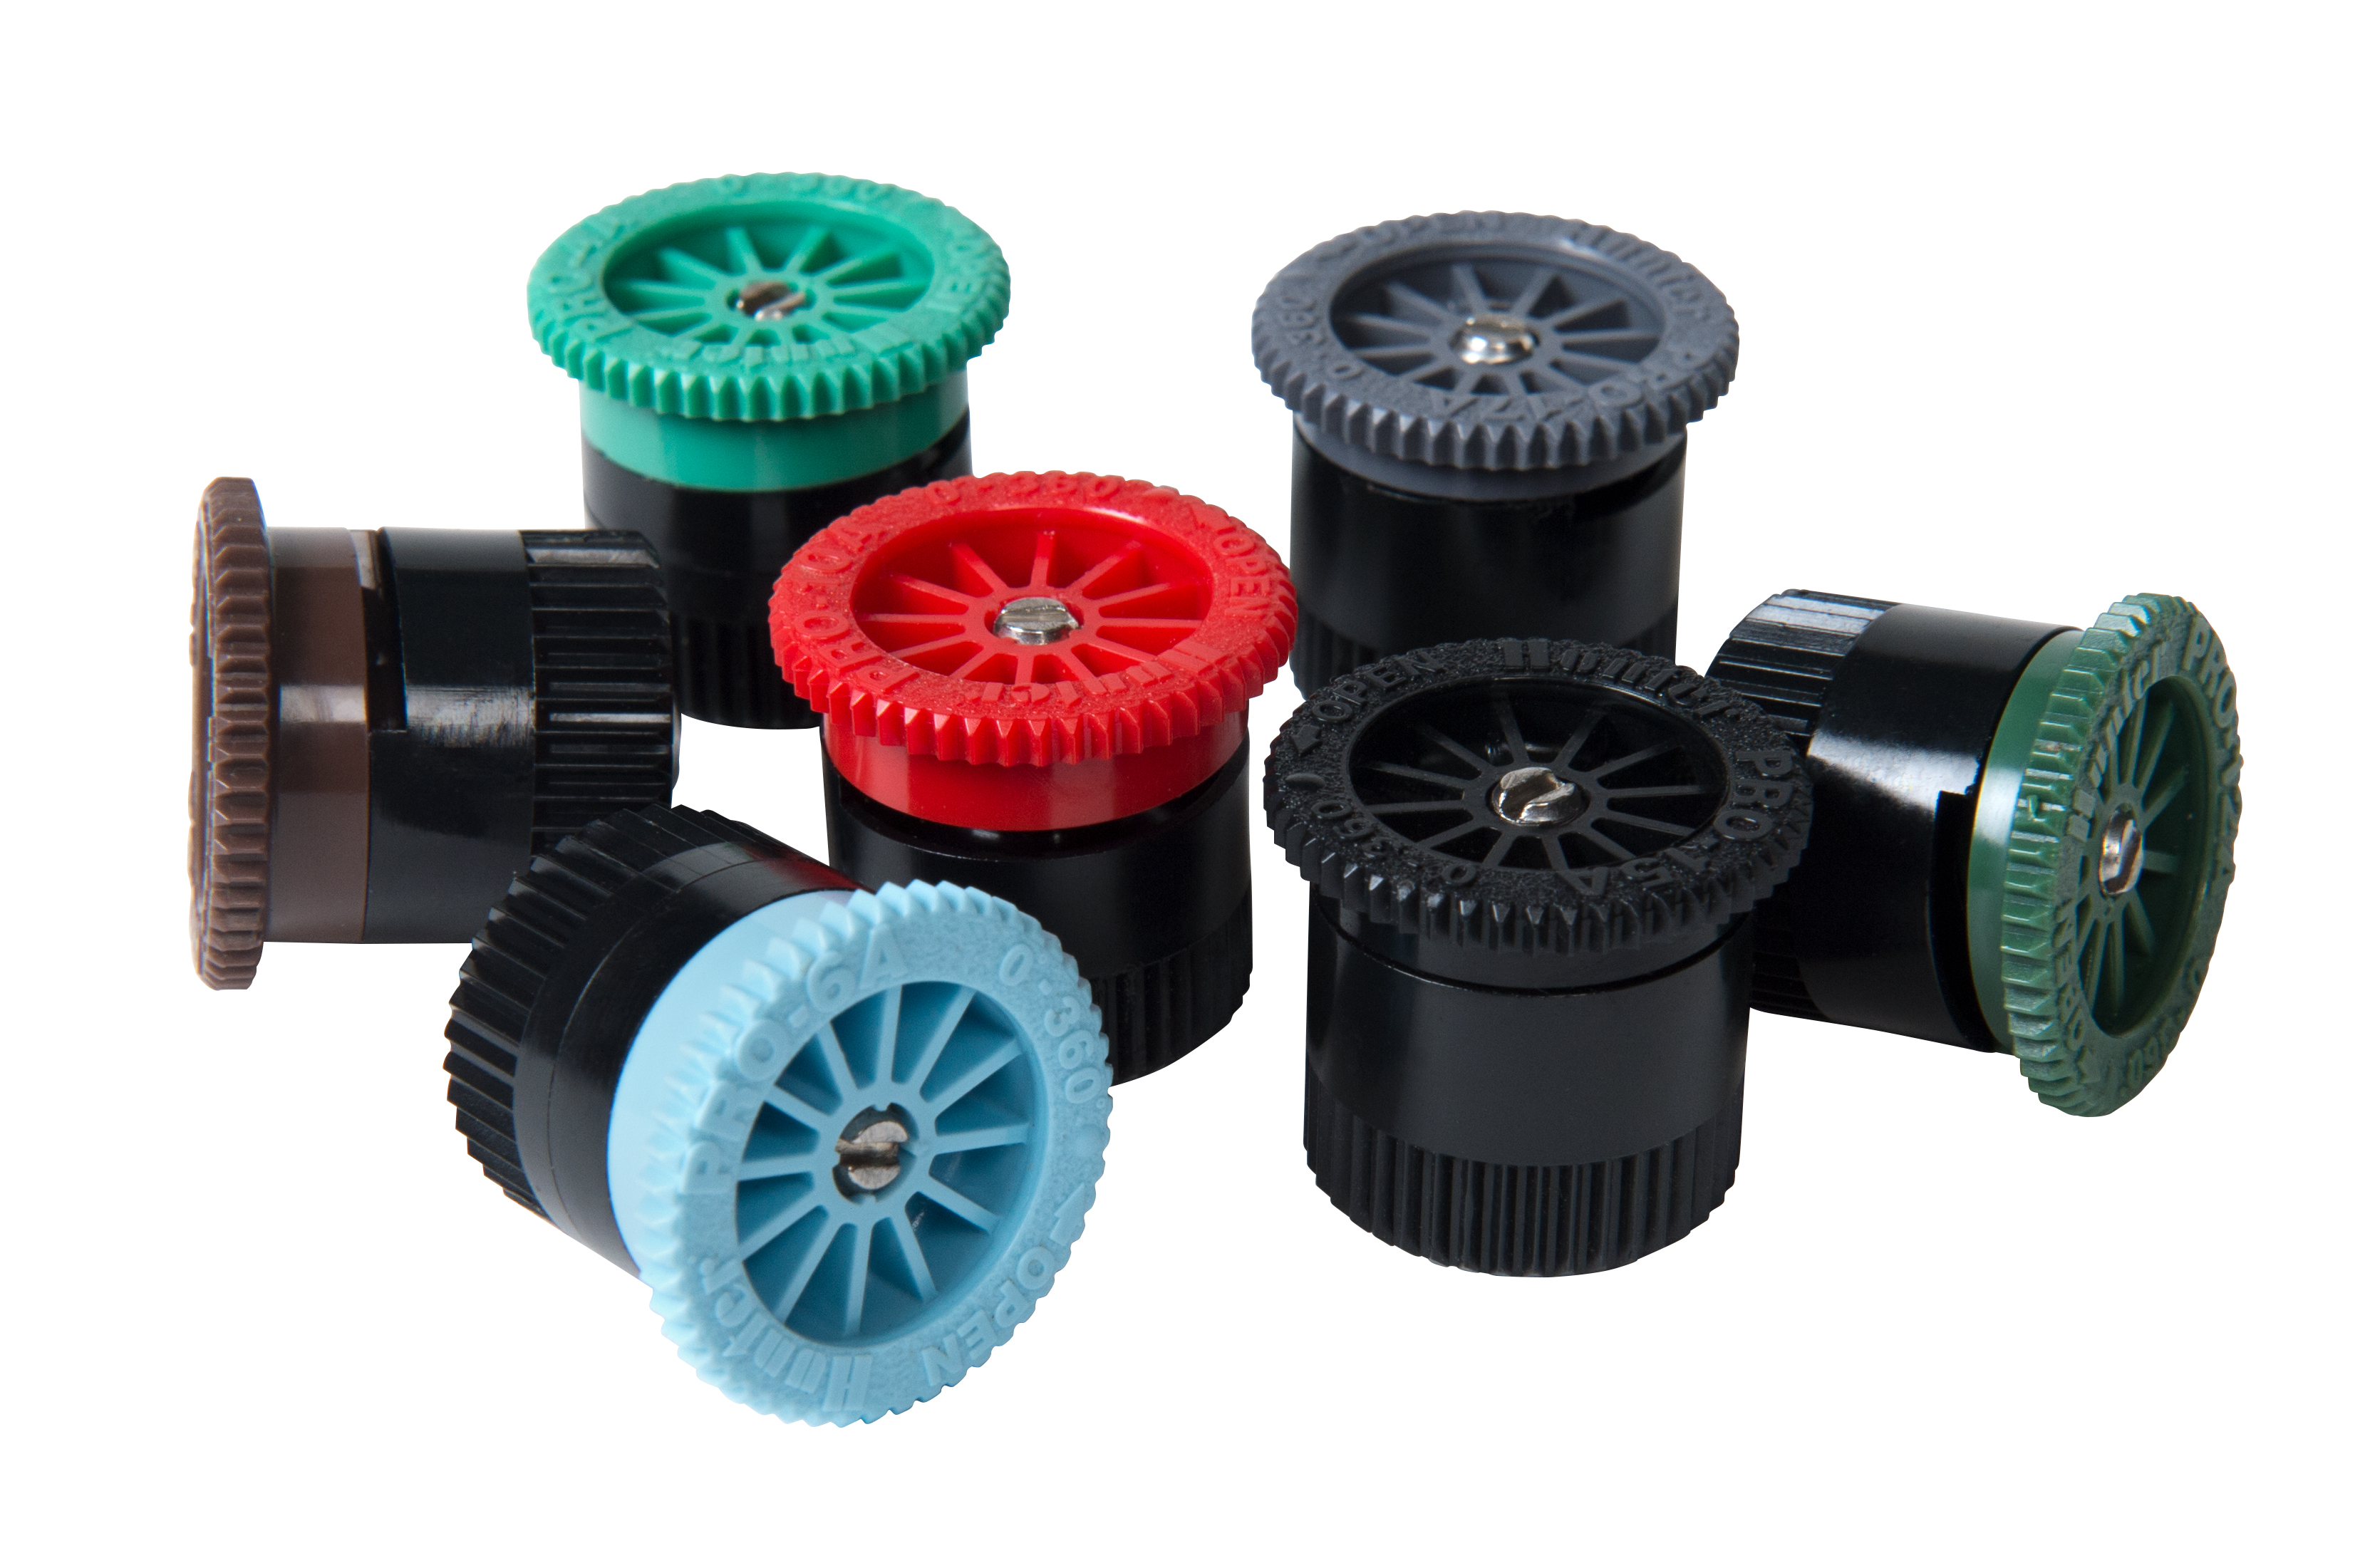 HUNTER A Düsen 0-360° für Versenkregner Bewässerung Regner PSU oder PRO-Spray